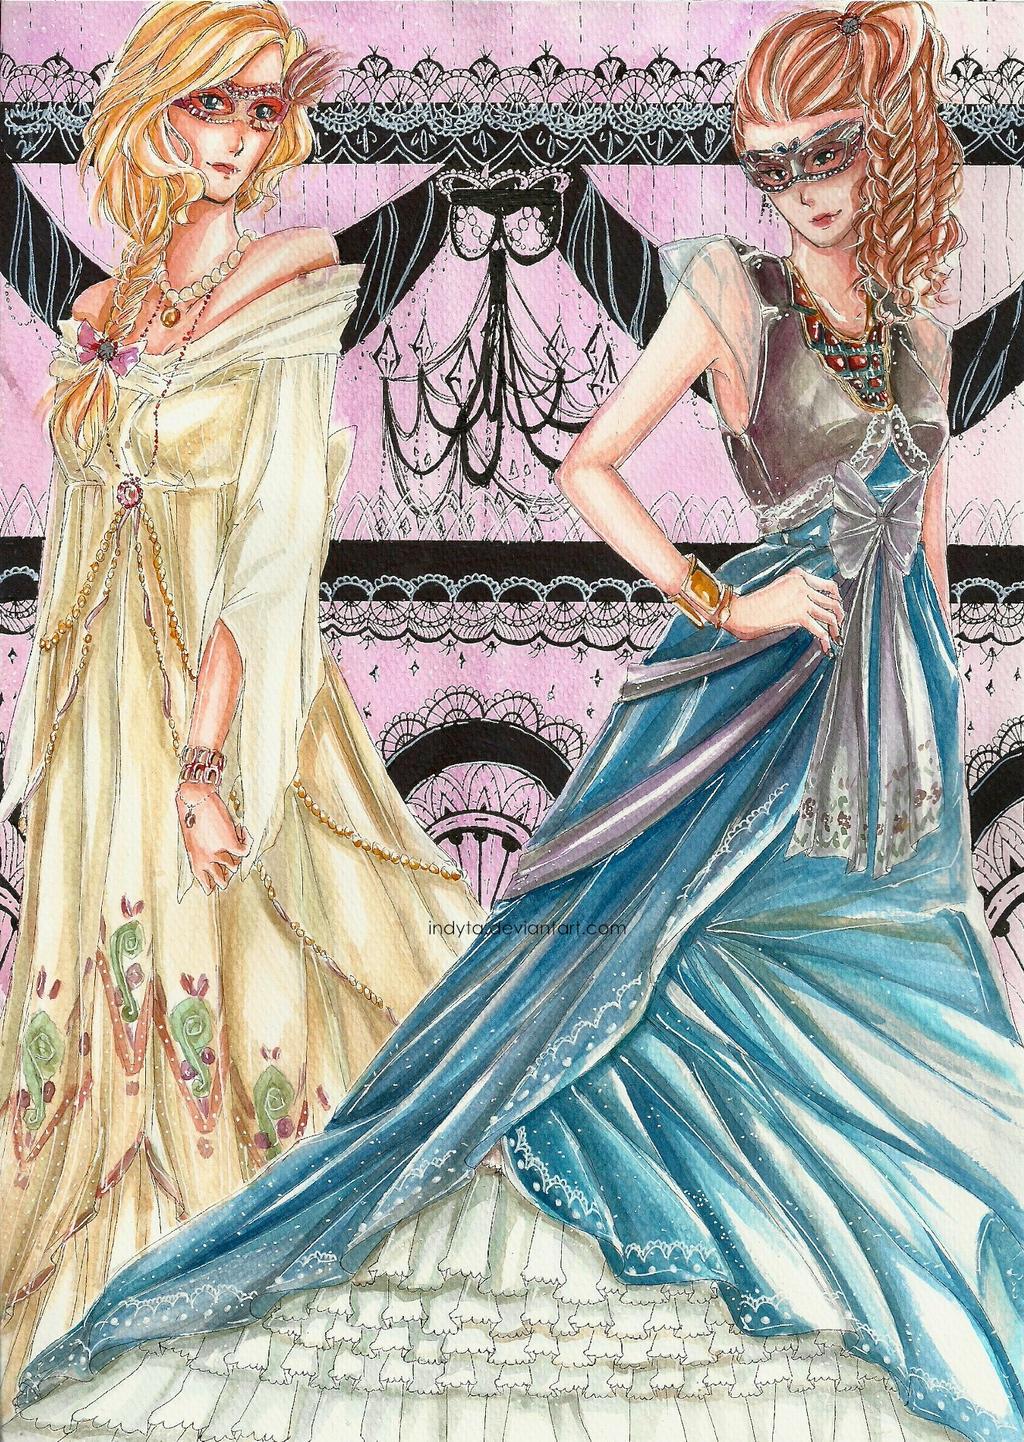 Masquerade by indyta